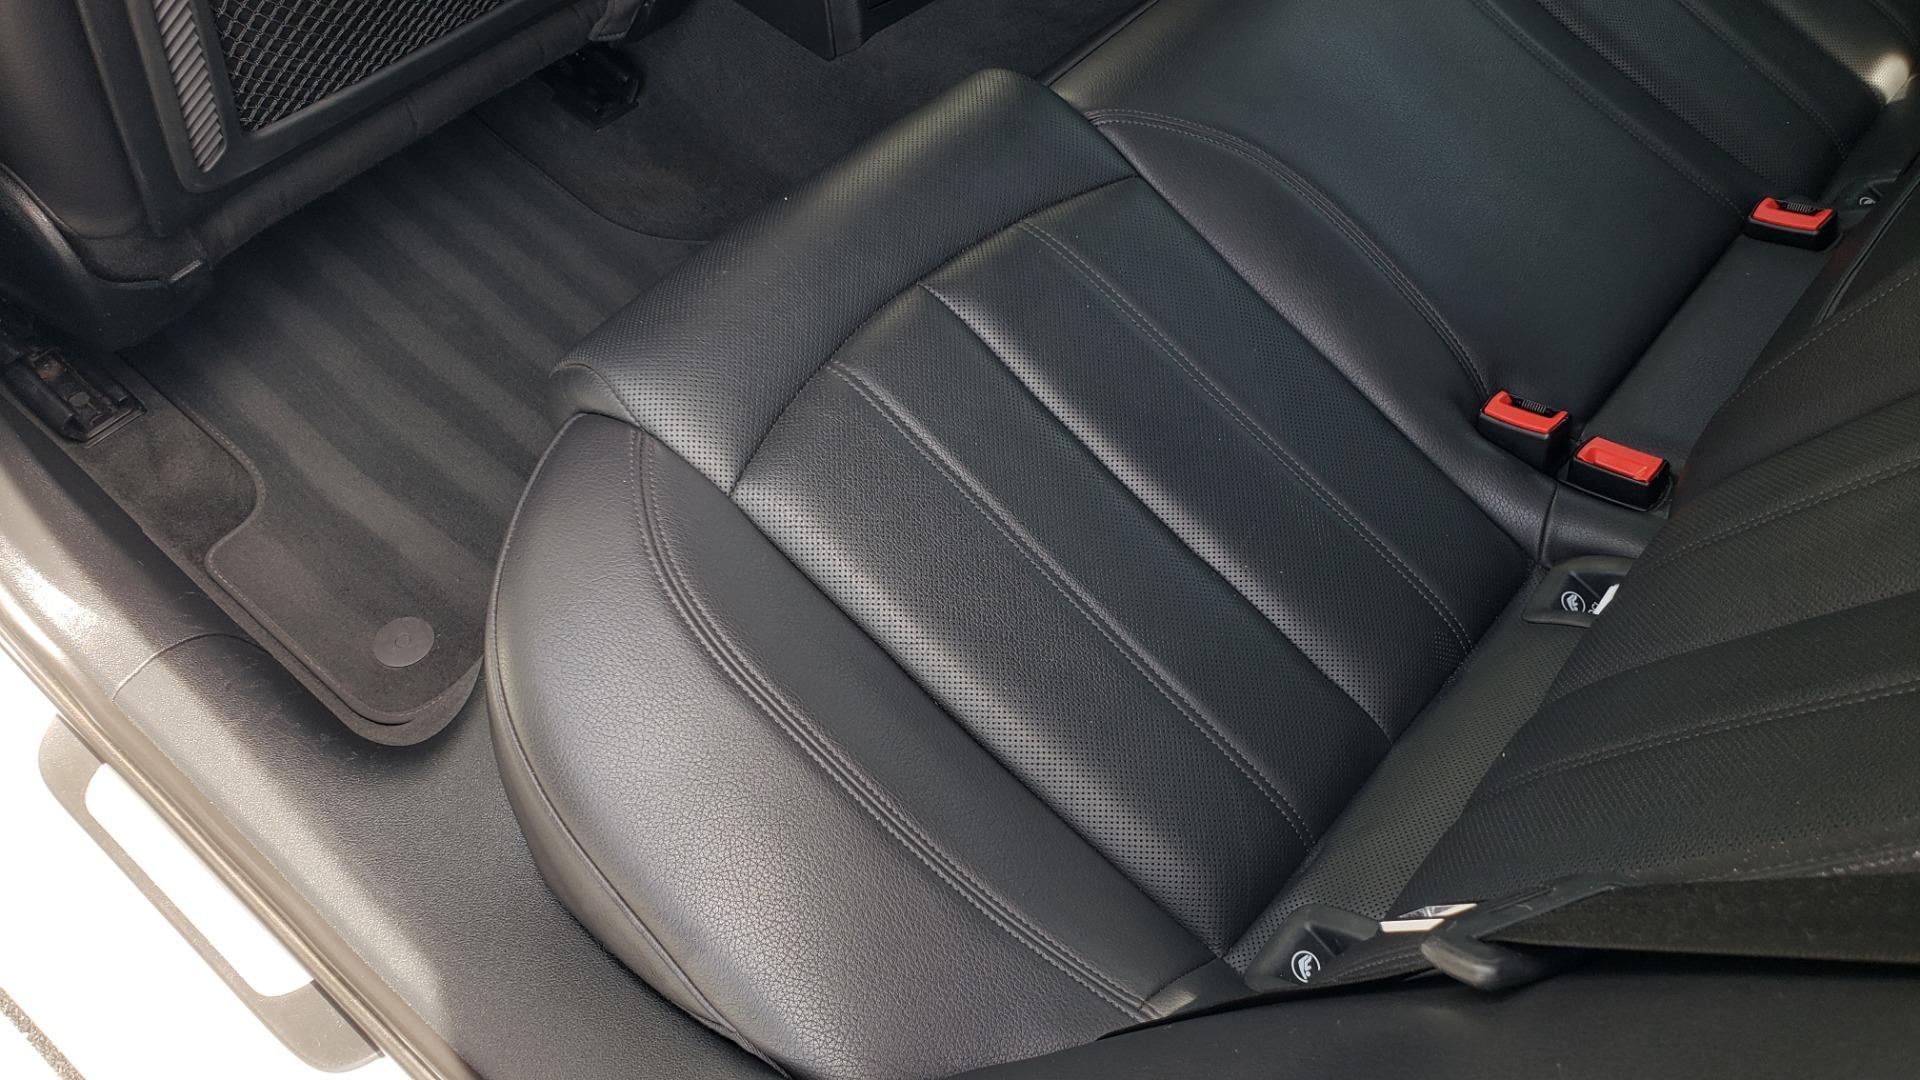 Used 2017 Audi A6 PRESTIGE SEDAN 3.0T / NAV / SUNROOF / BLACK OPTIC / CLD WTHR / REARVIEW for sale $30,797 at Formula Imports in Charlotte NC 28227 66